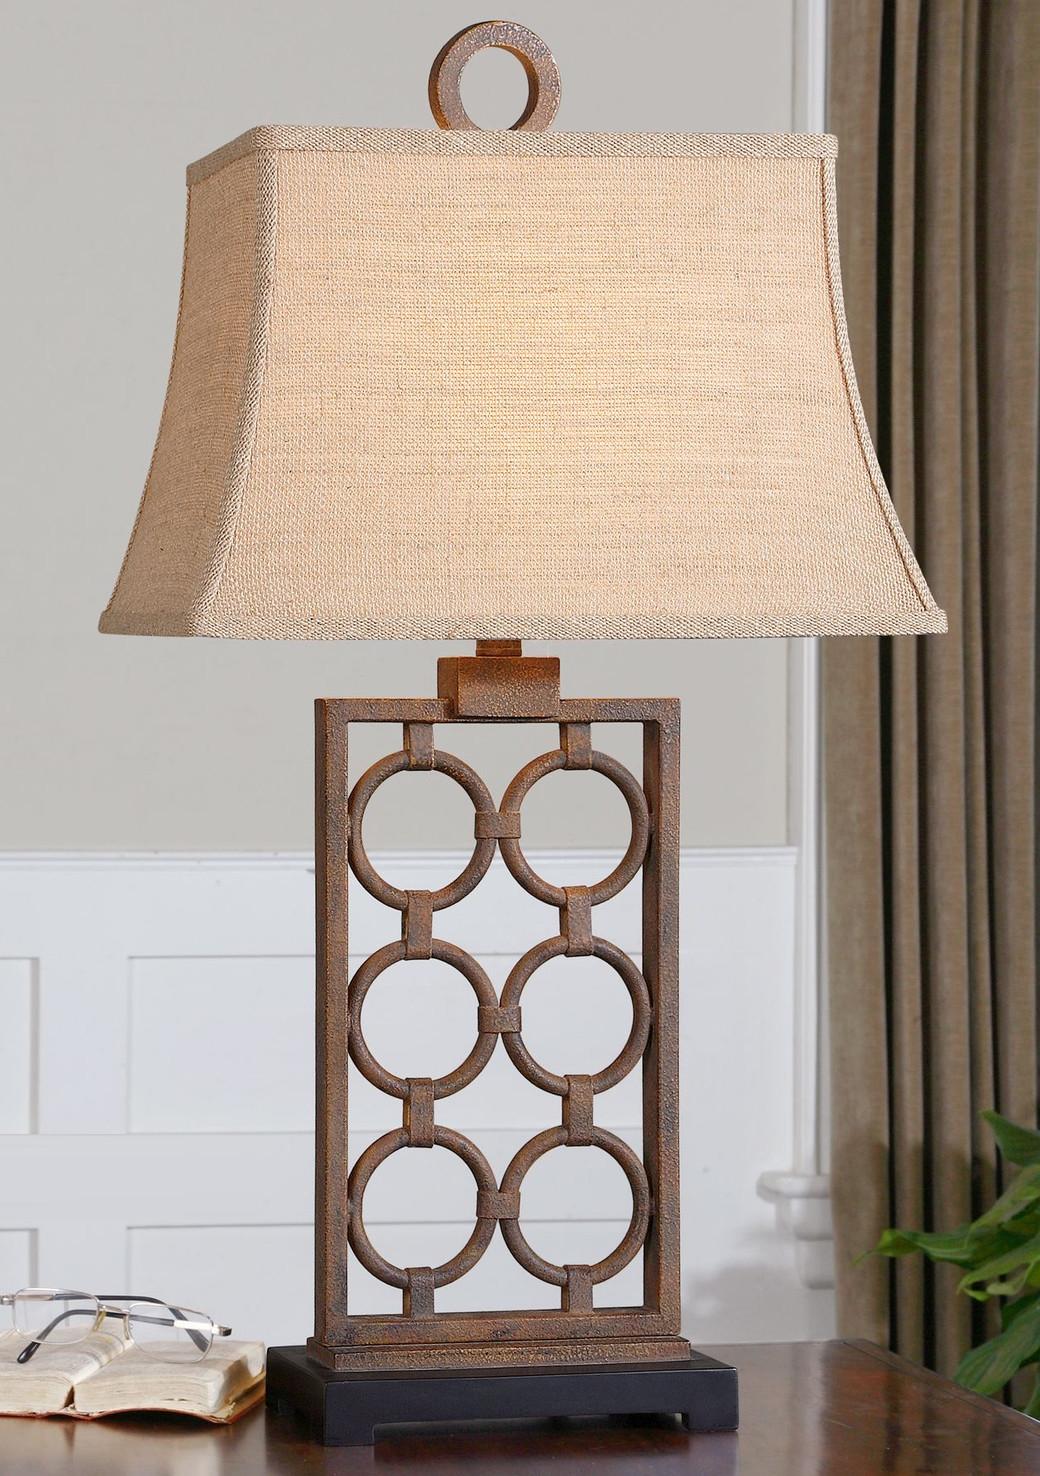 Dardenne+Table+Lamp.jpg